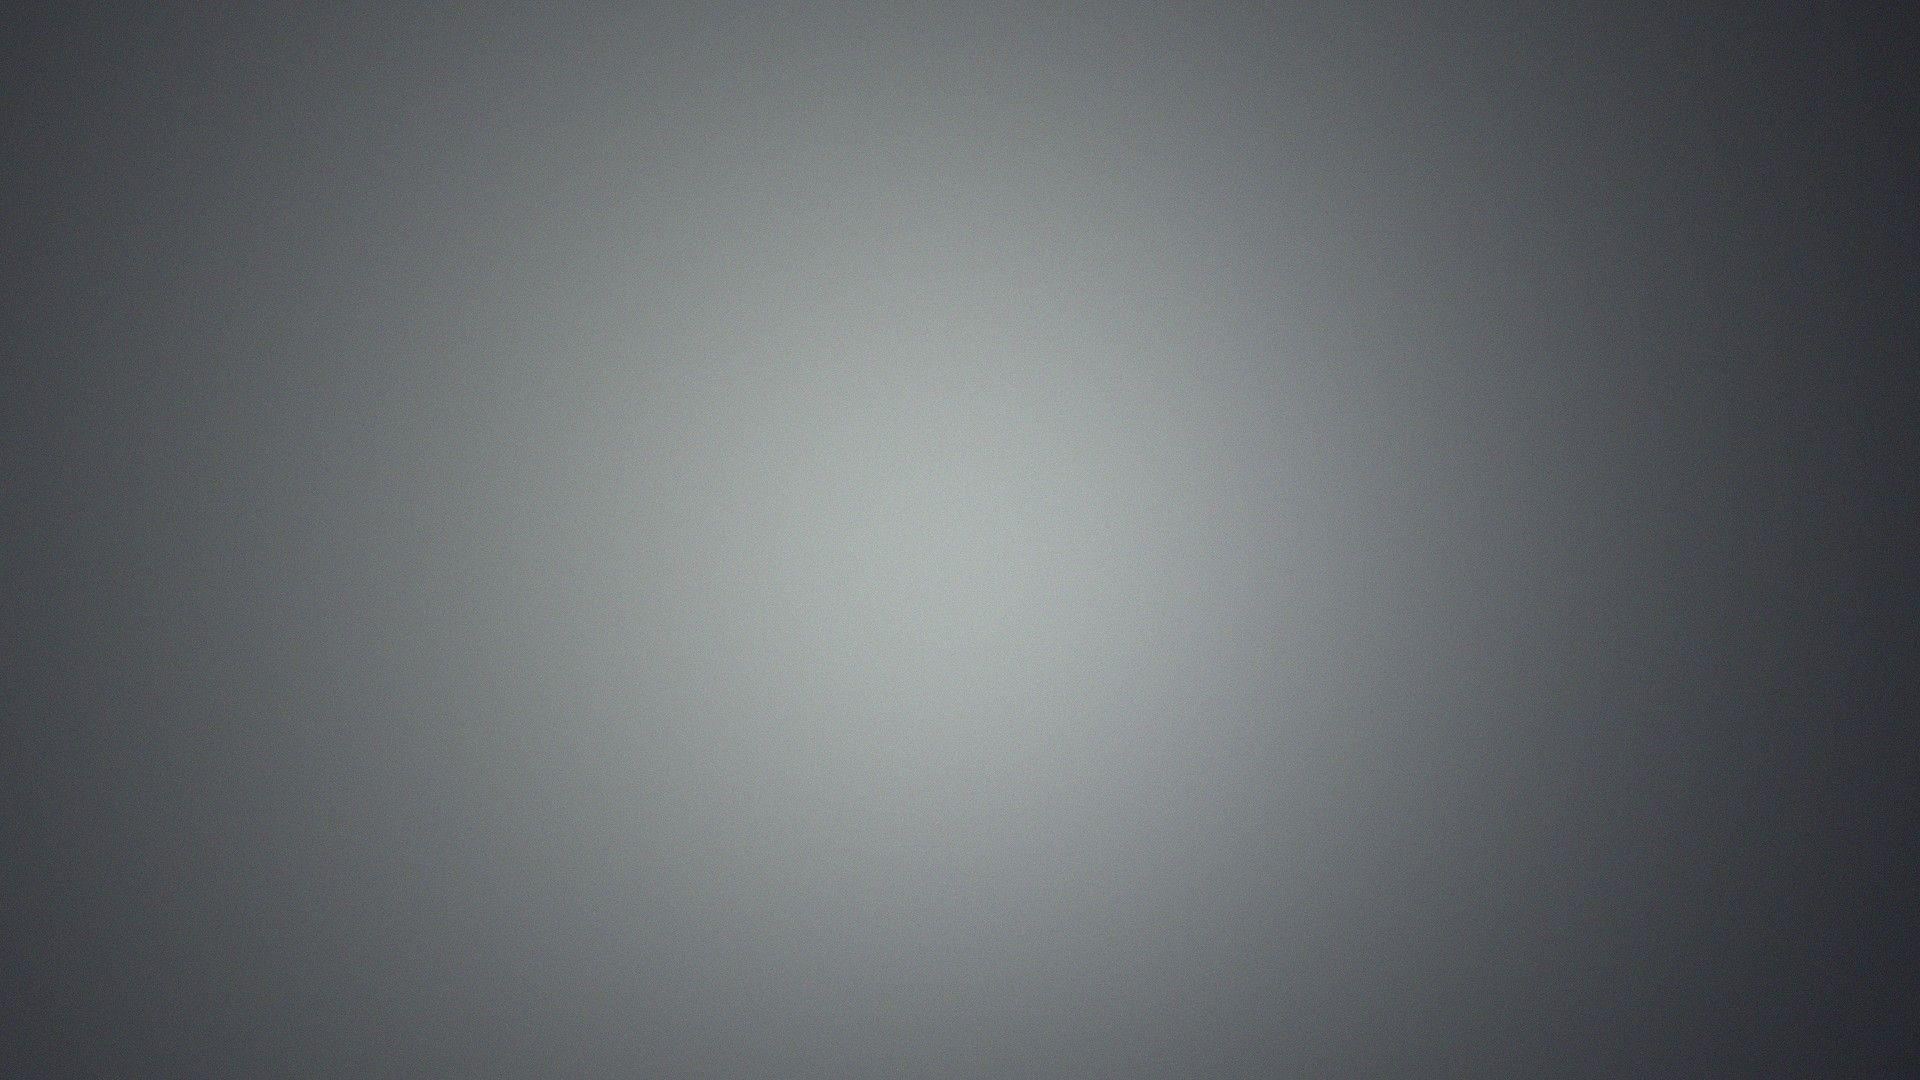 10 New Grey Gra nt Background Hd FULL HD 1920—1080 For PC Desktop